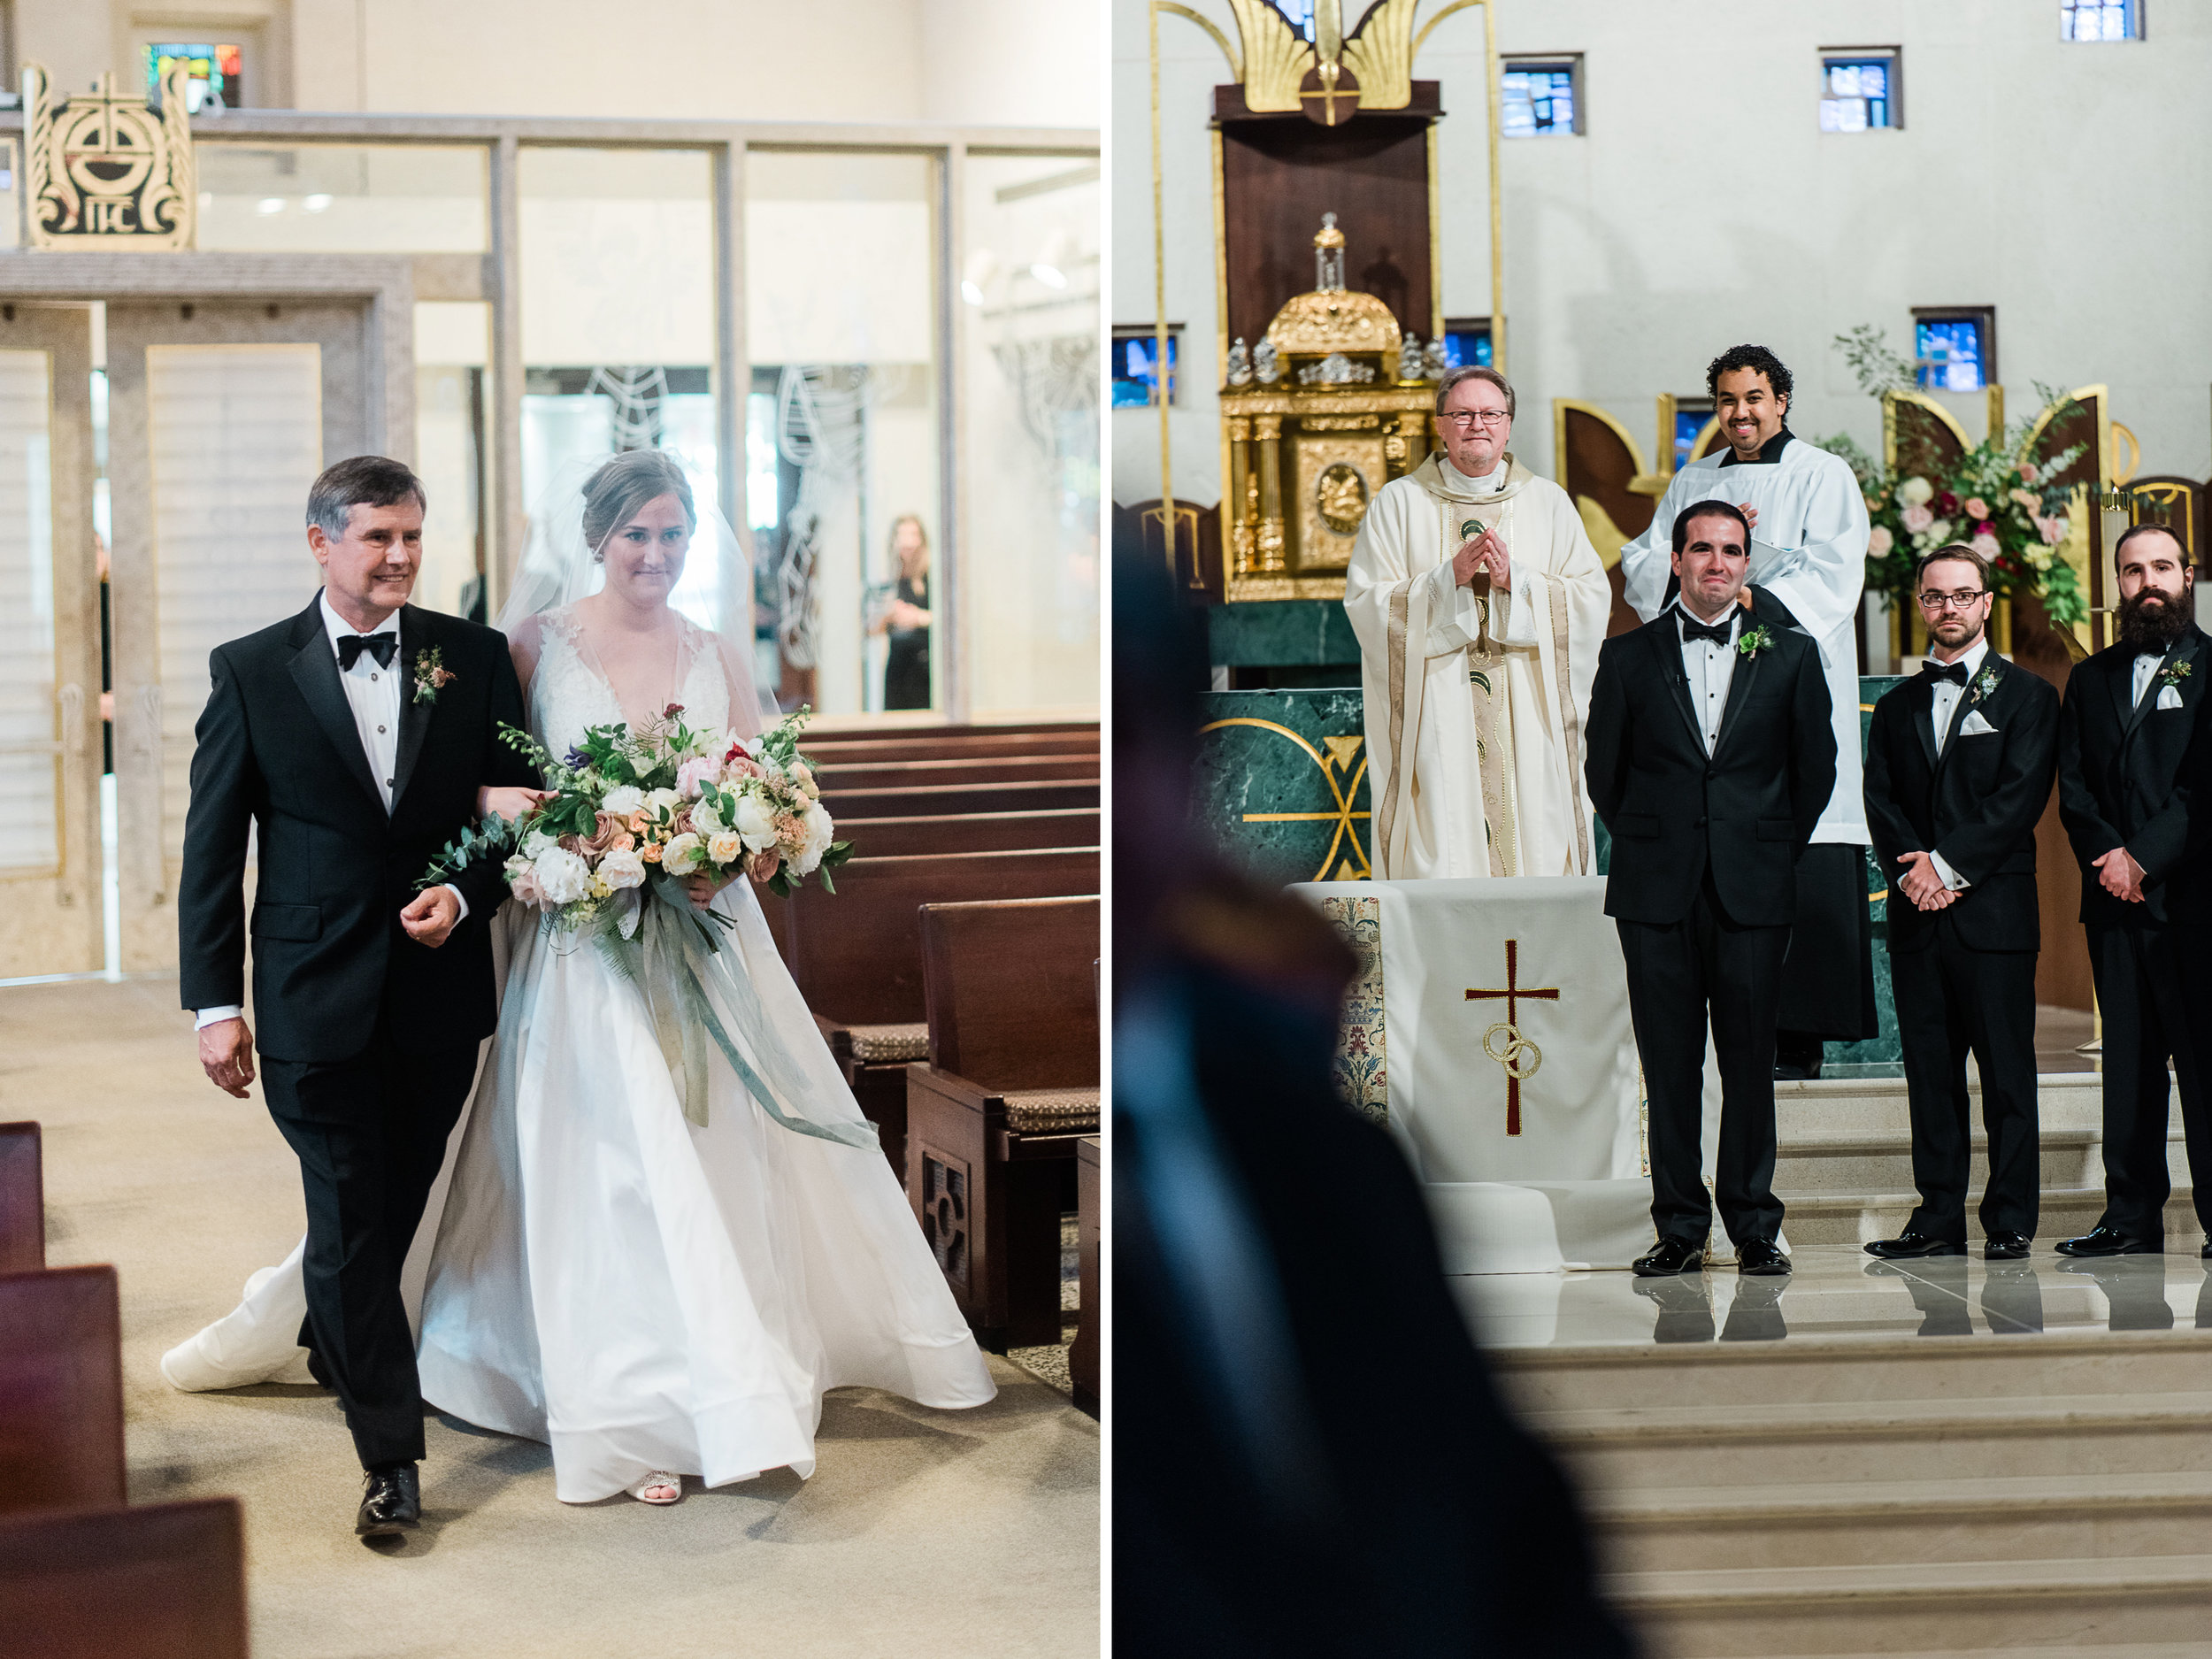 St-Michaels-Catholic-Church-Houston-Wedding-Ceremony-Josh-Dana-Fernandez-Photographer-Destination-Austin-Dallas-Fine-Art-Film-101.jpg